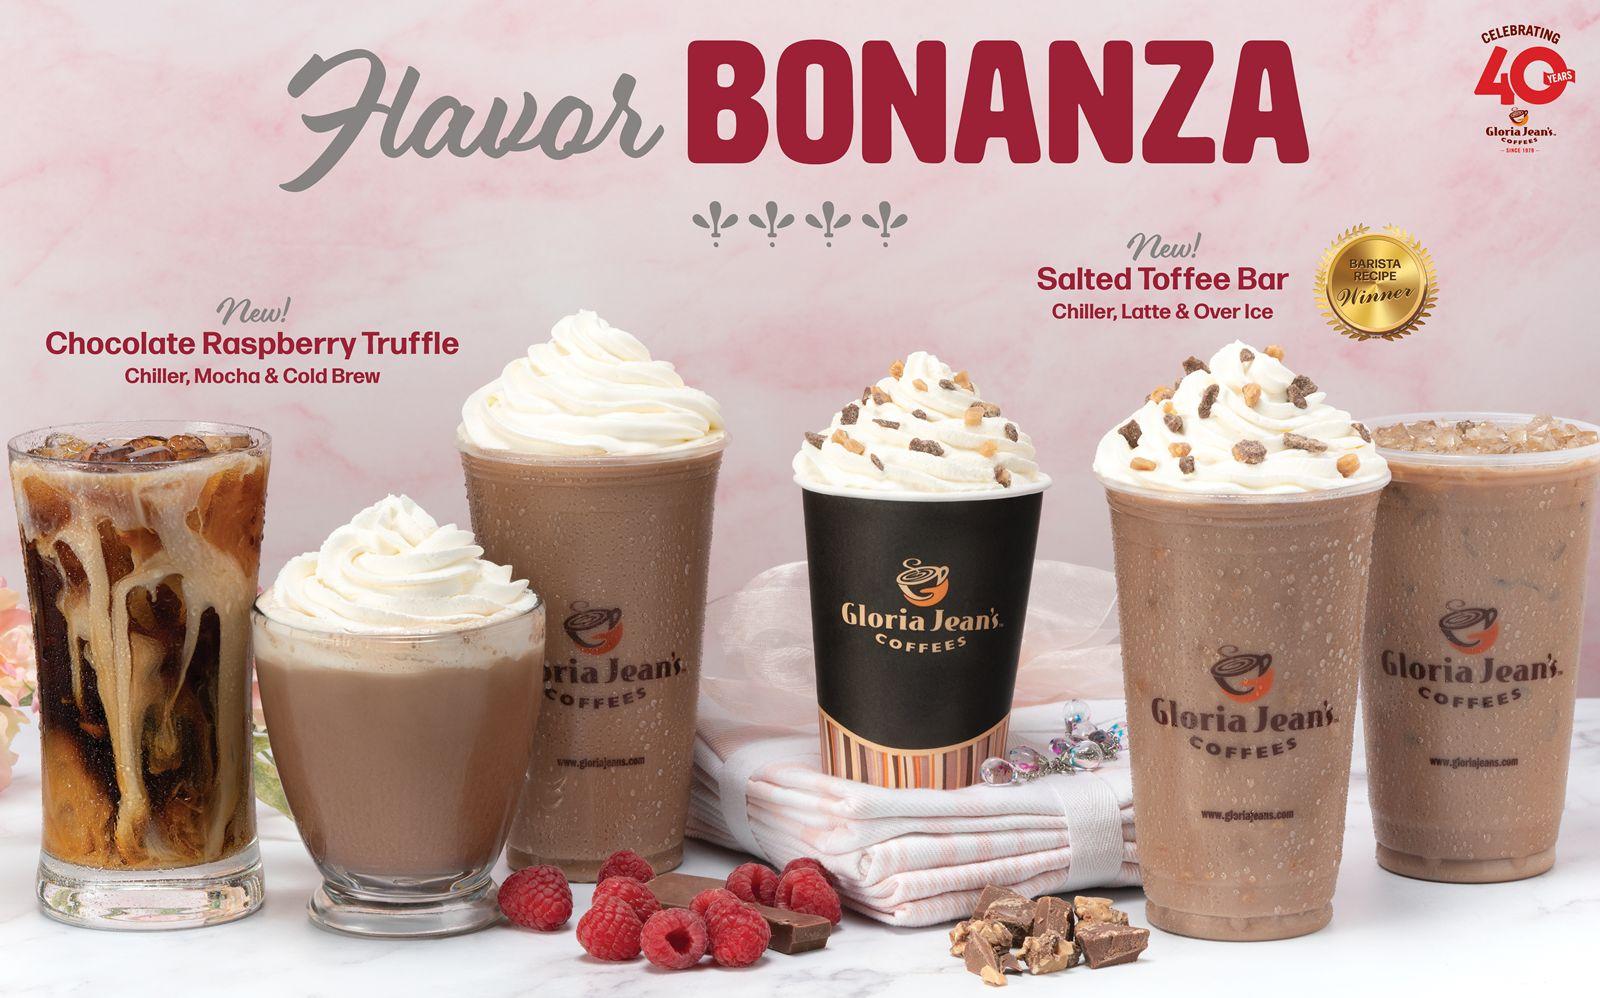 Gloria Jean's Coffees' Winter Menu Raises the Bar on Sweet & Salty!